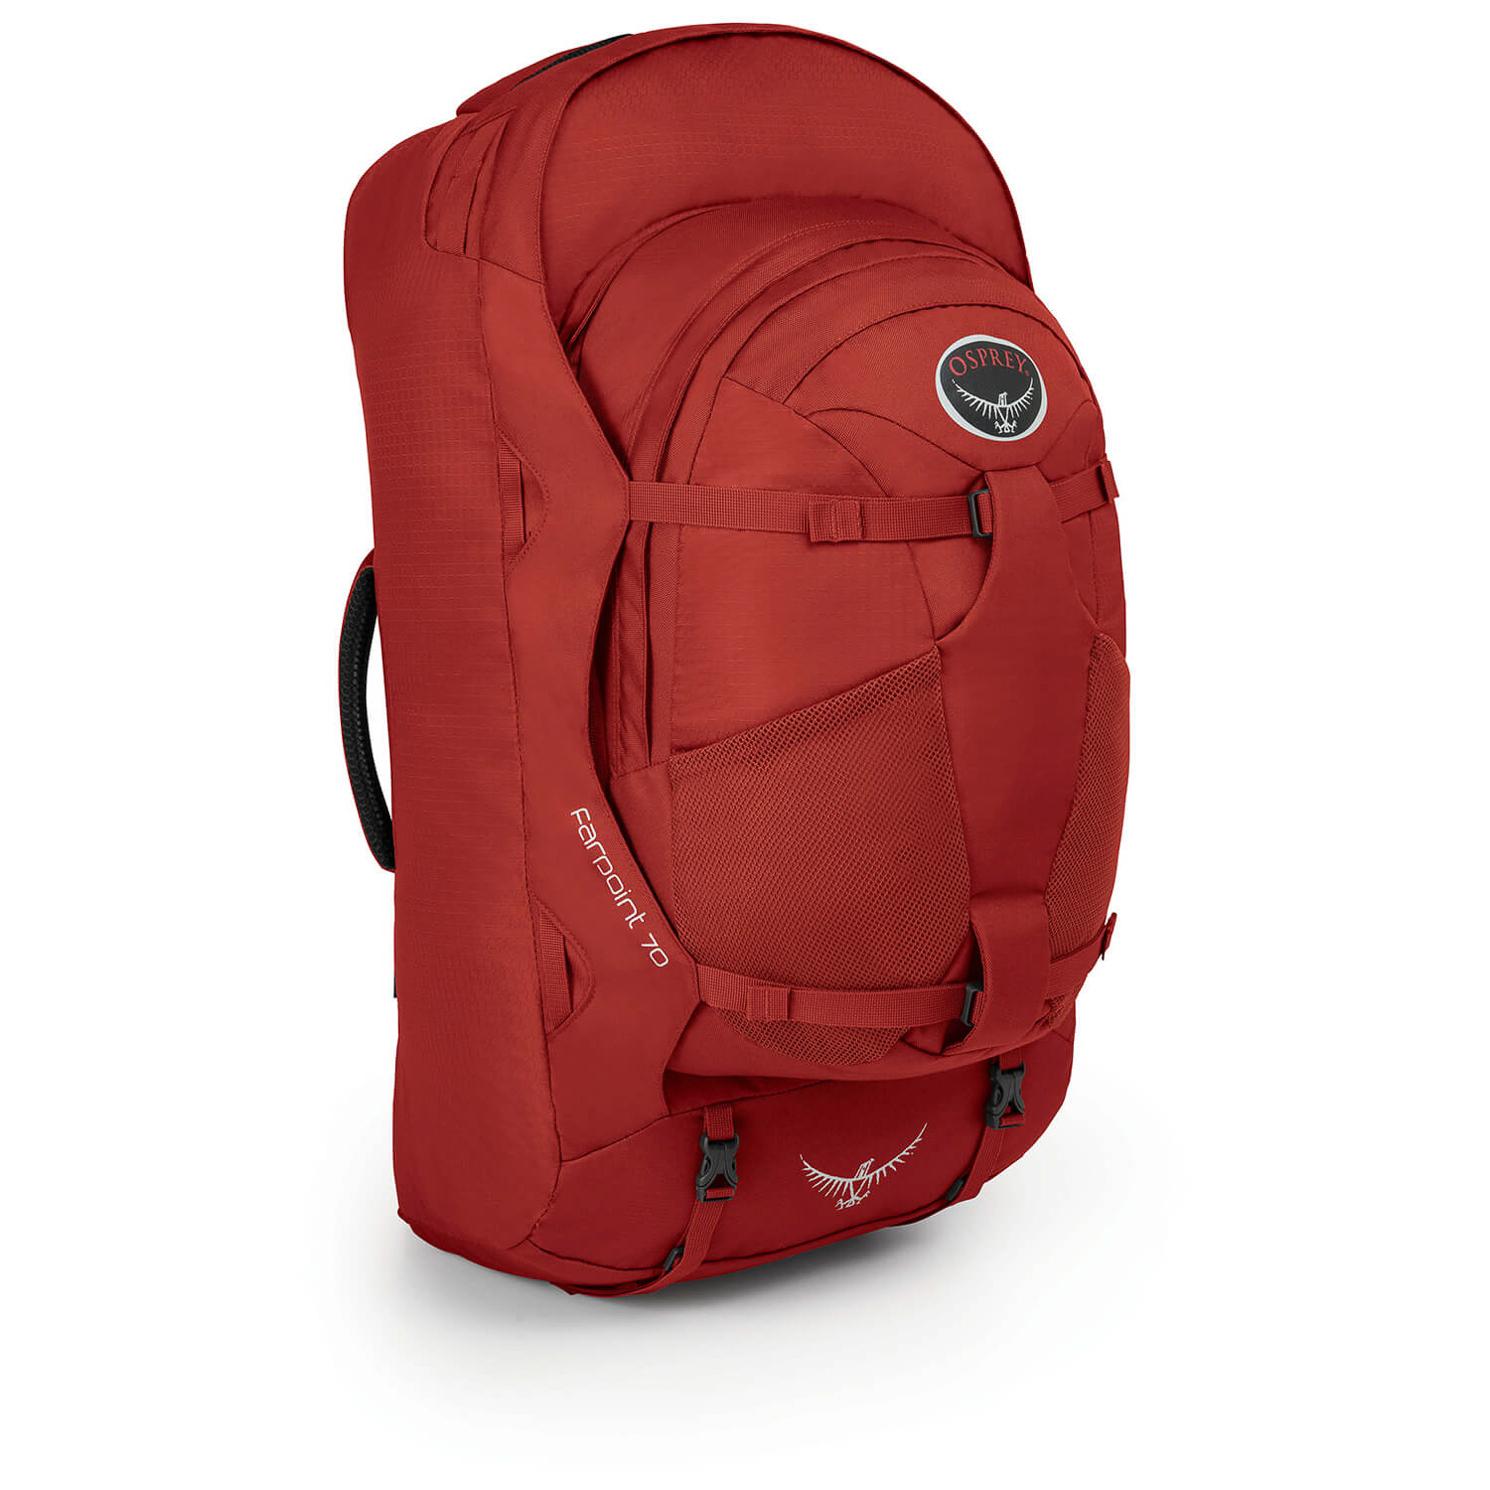 Osprey Farpoint  Travel Backpack Uk